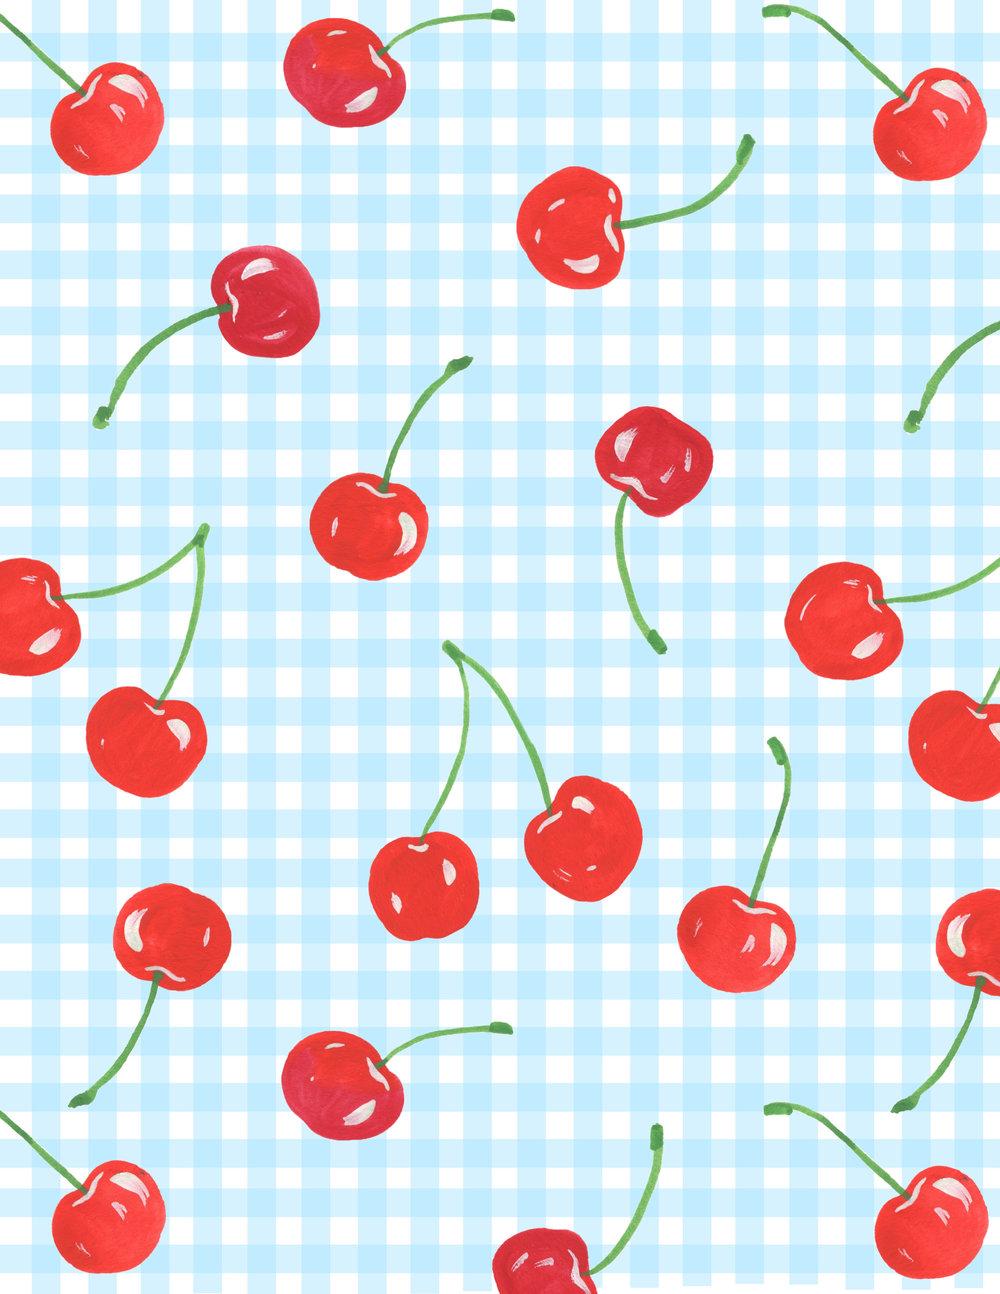 Cellrare-cherries.jpg